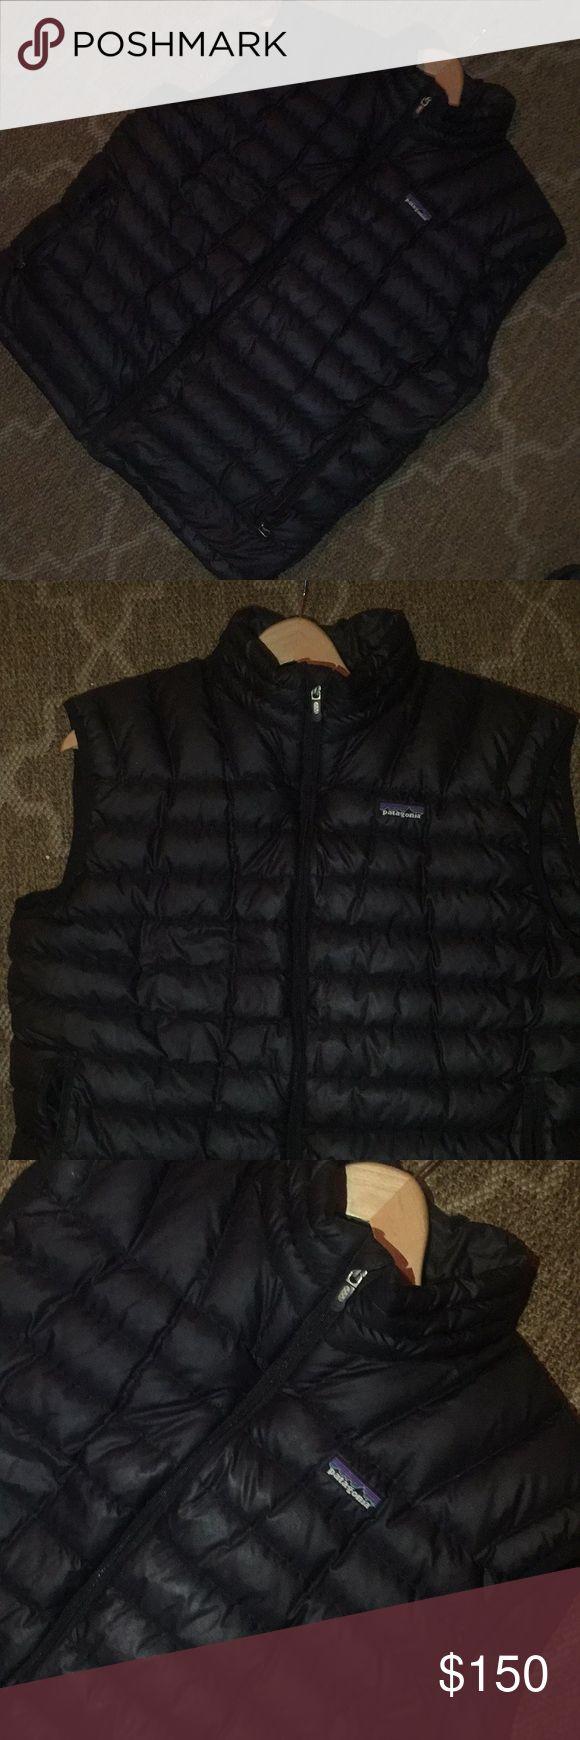 Patagonia Puffer Jacket Black Puffer Jacket Jackets Puffer Jackets [ 1740 x 580 Pixel ]